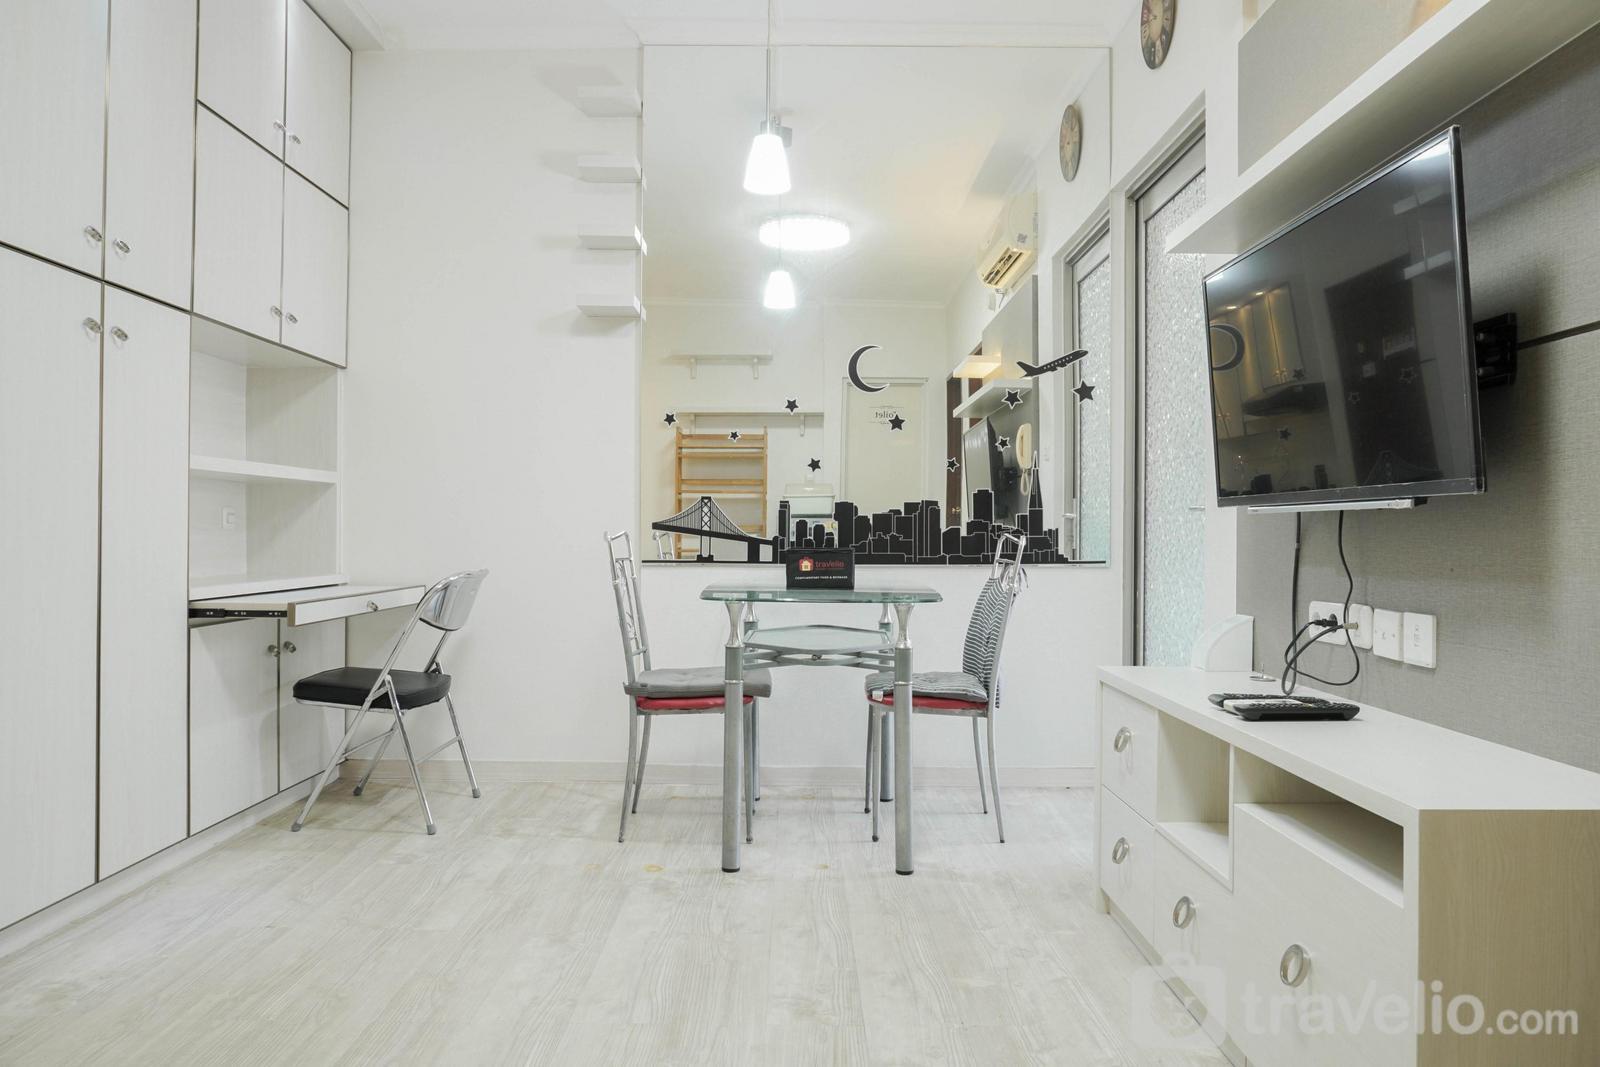 Apartemen Mediterania Garden Residence 1 - Comfy 2BR Apartment at Mediterania Garden Residence 1 By Travelio